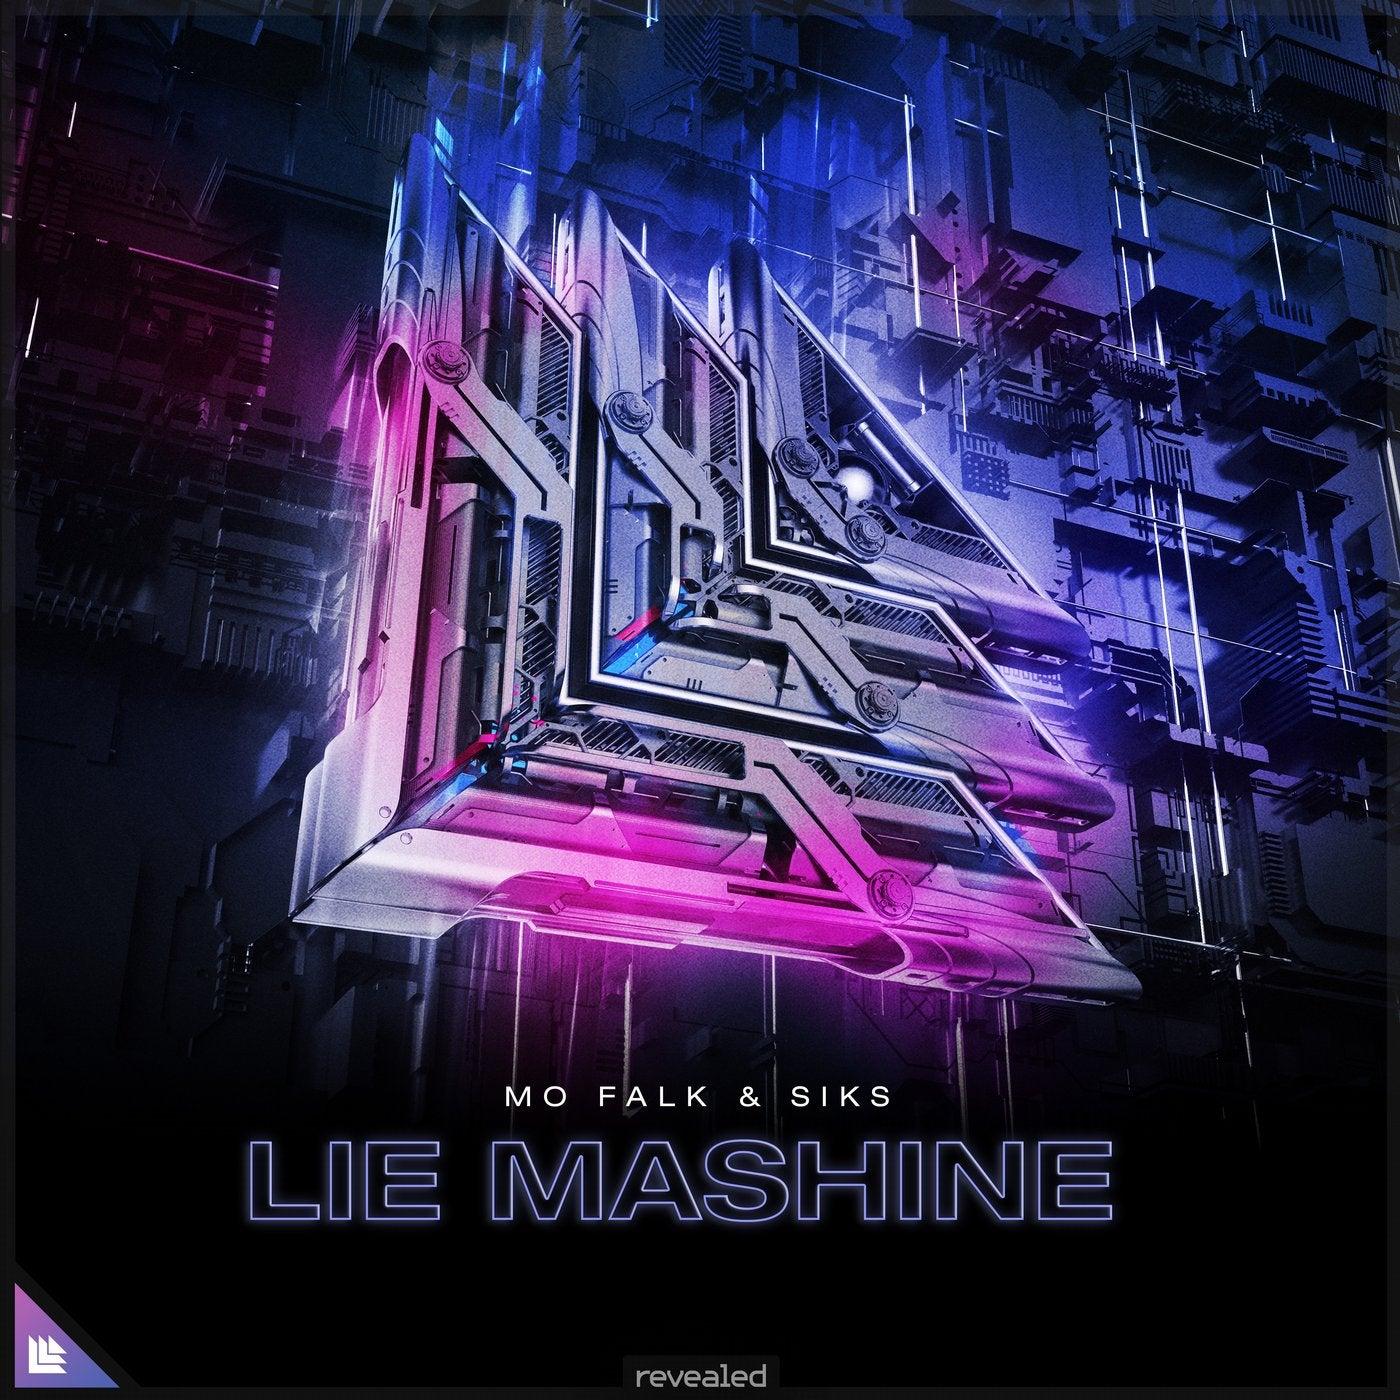 Lie Mashine (Extended Mix)